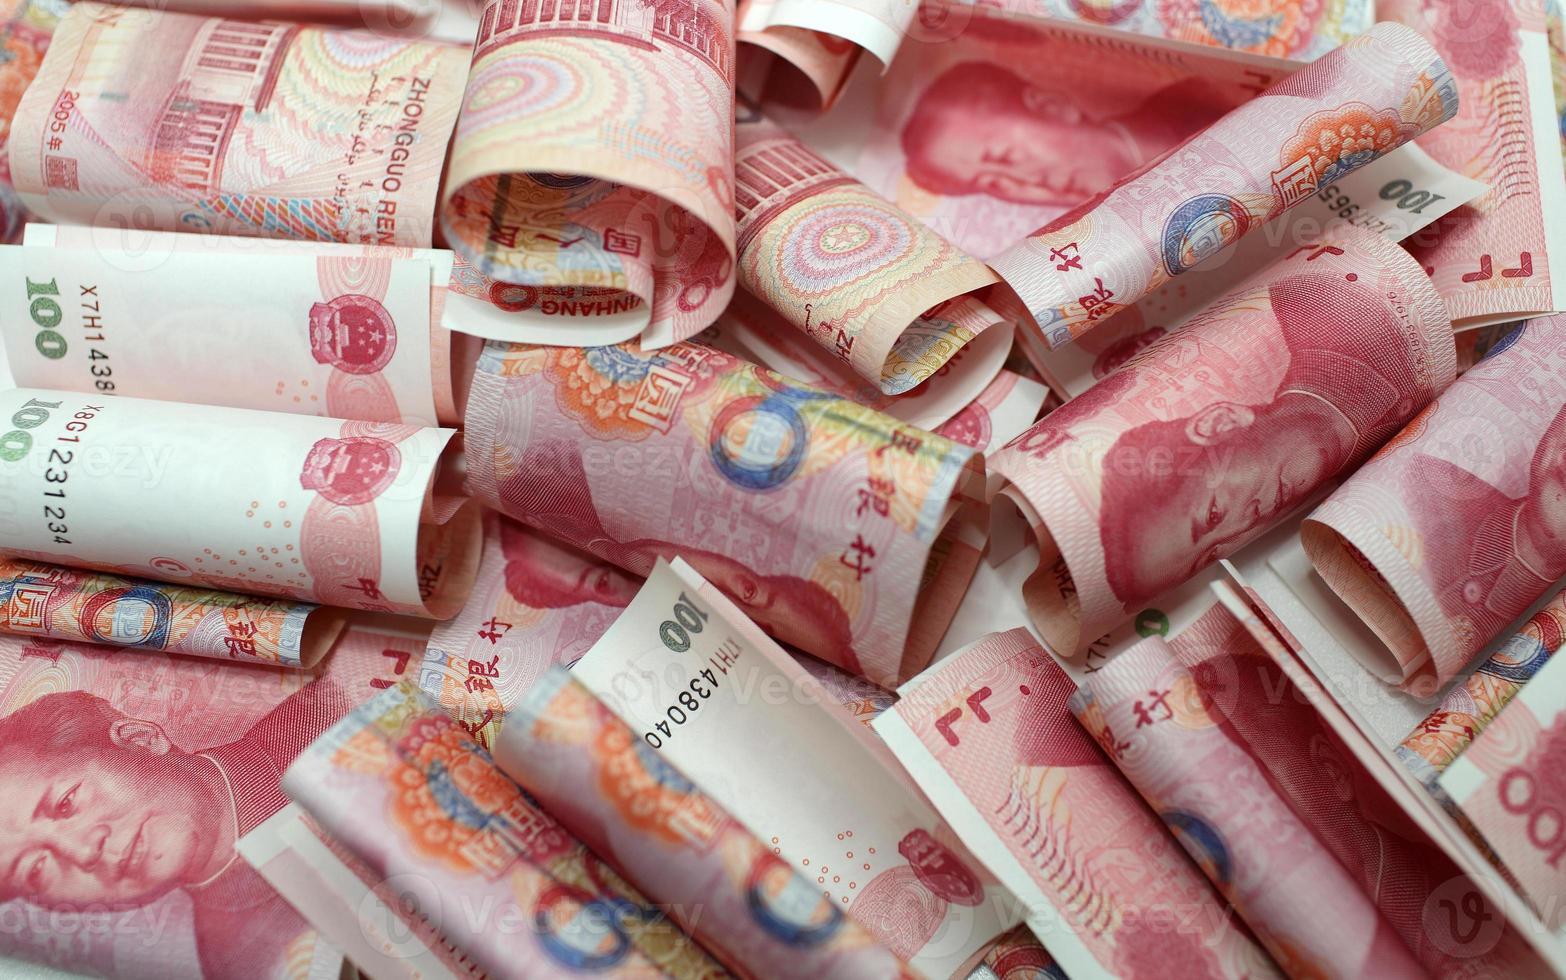 Chinese yuan geld 100 rmb achtergrond knoeien foto